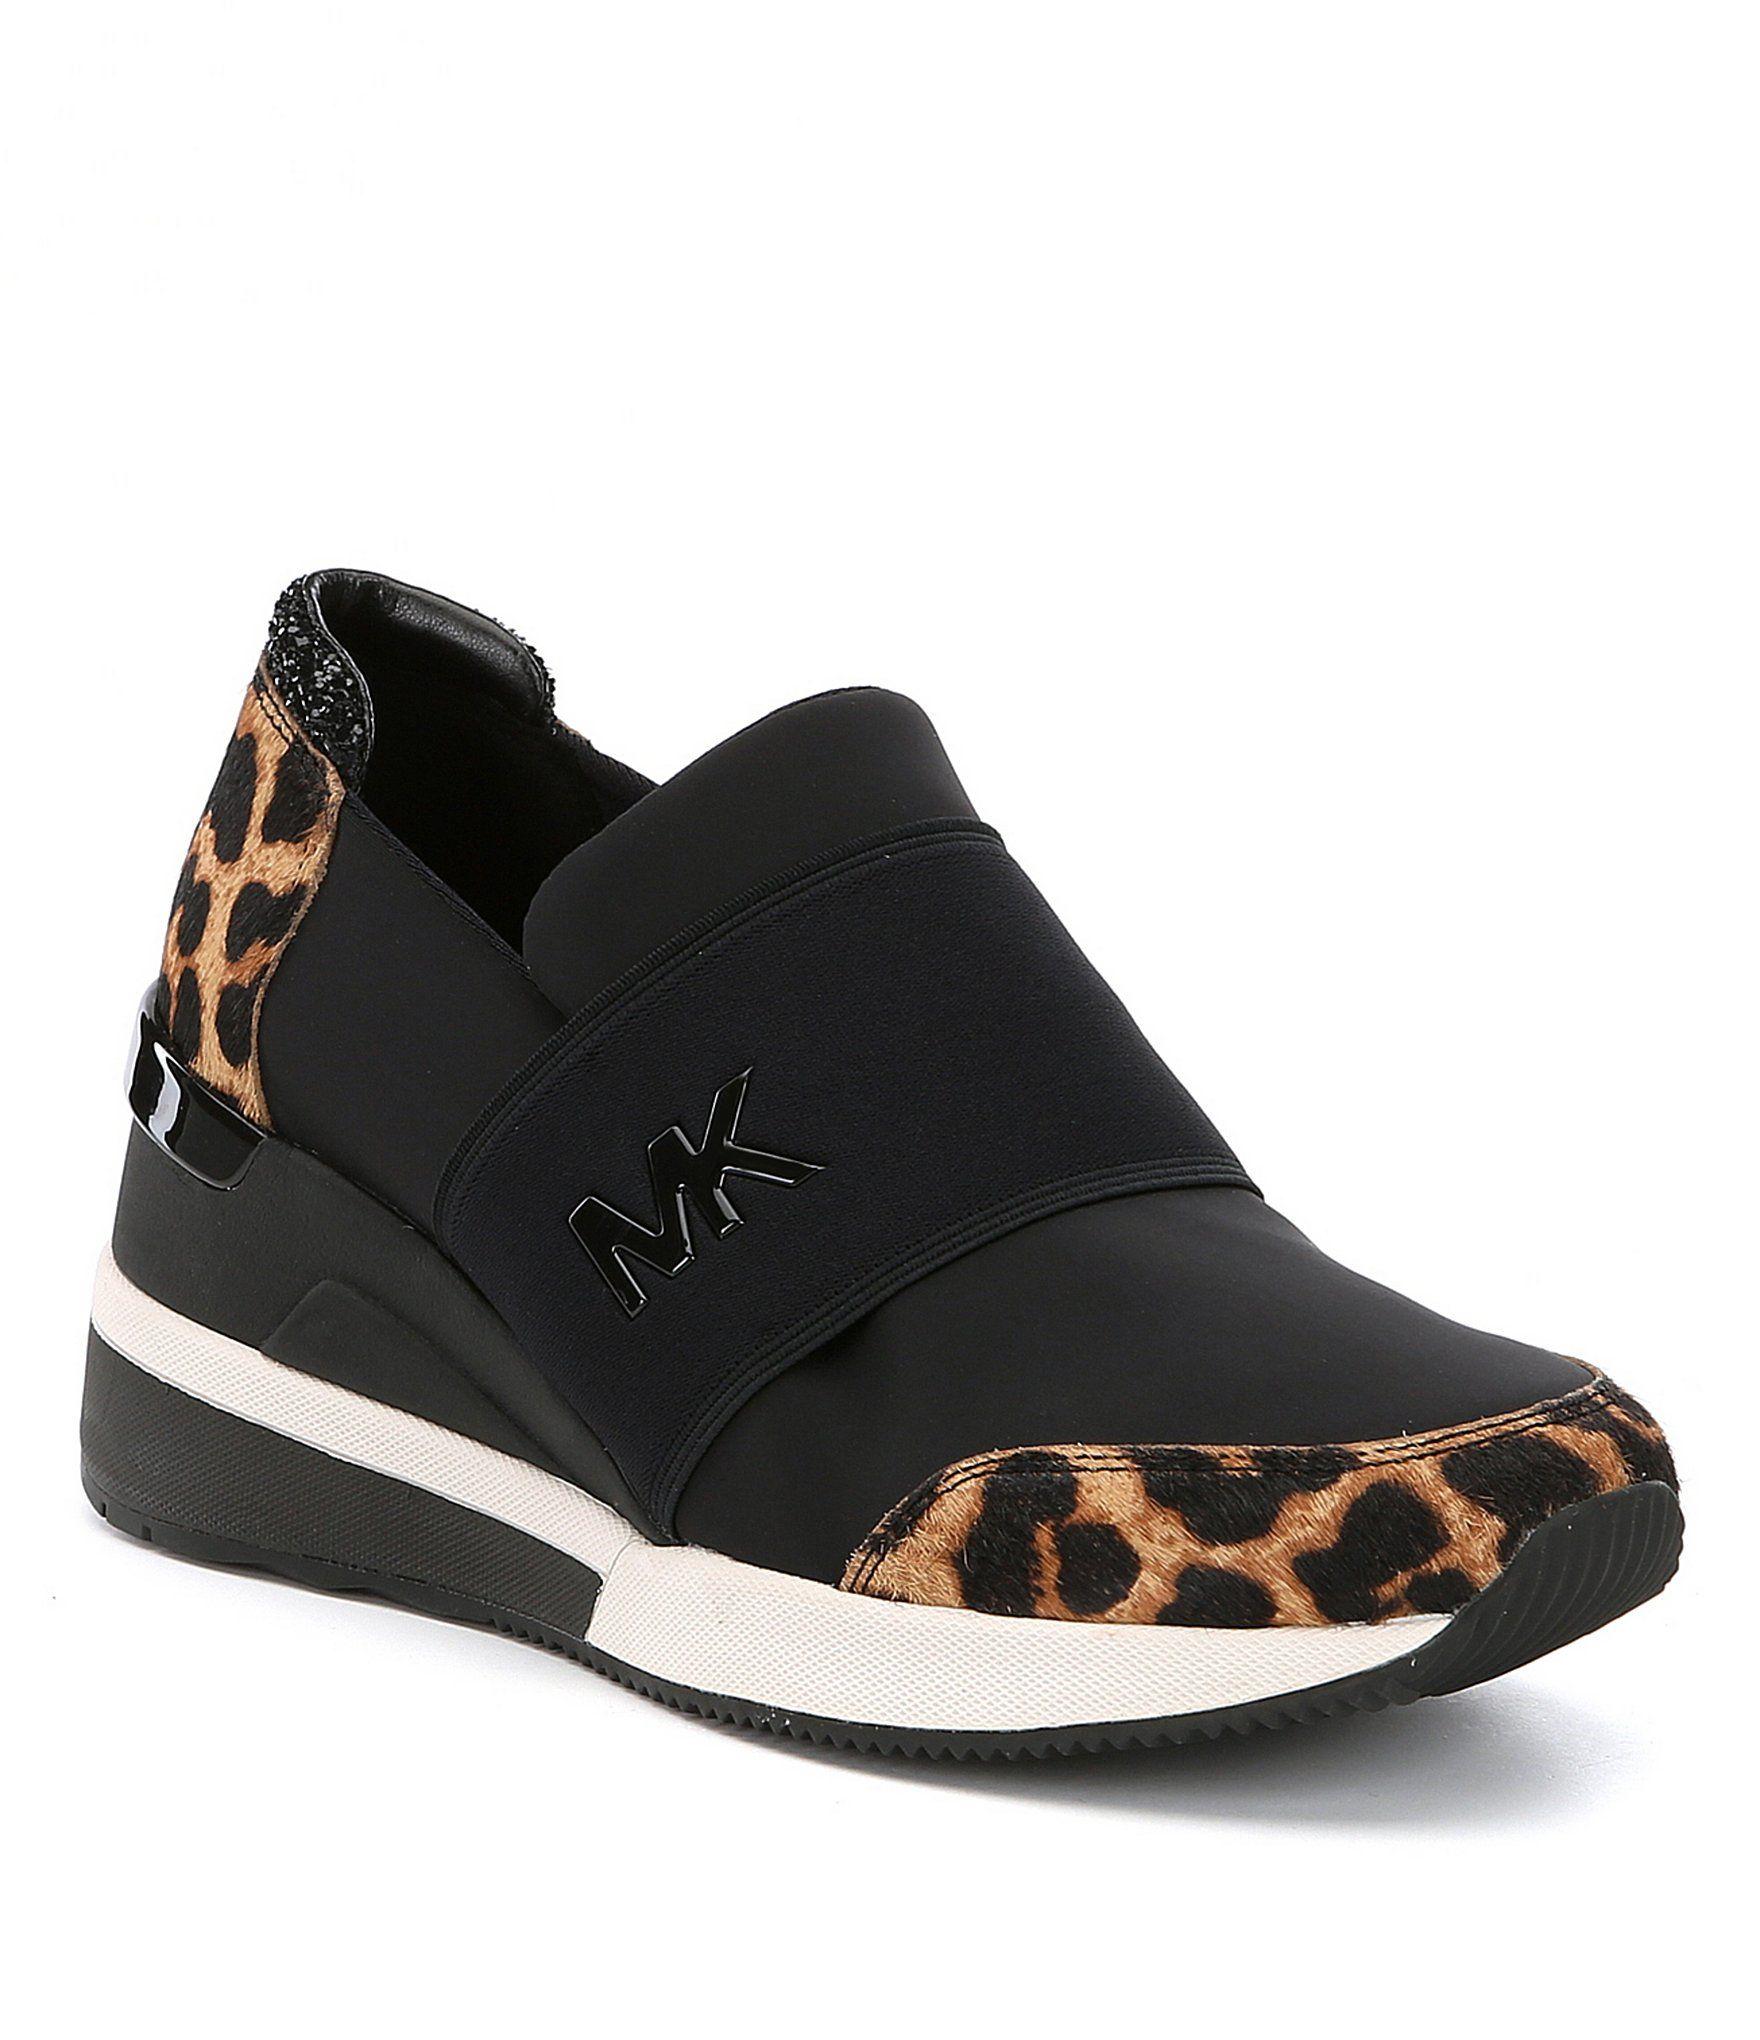 08ecee362bc8 MICHAEL Michael Kors Felix Cheetah Print Calf Hair Trainer Sneakers   Dillards